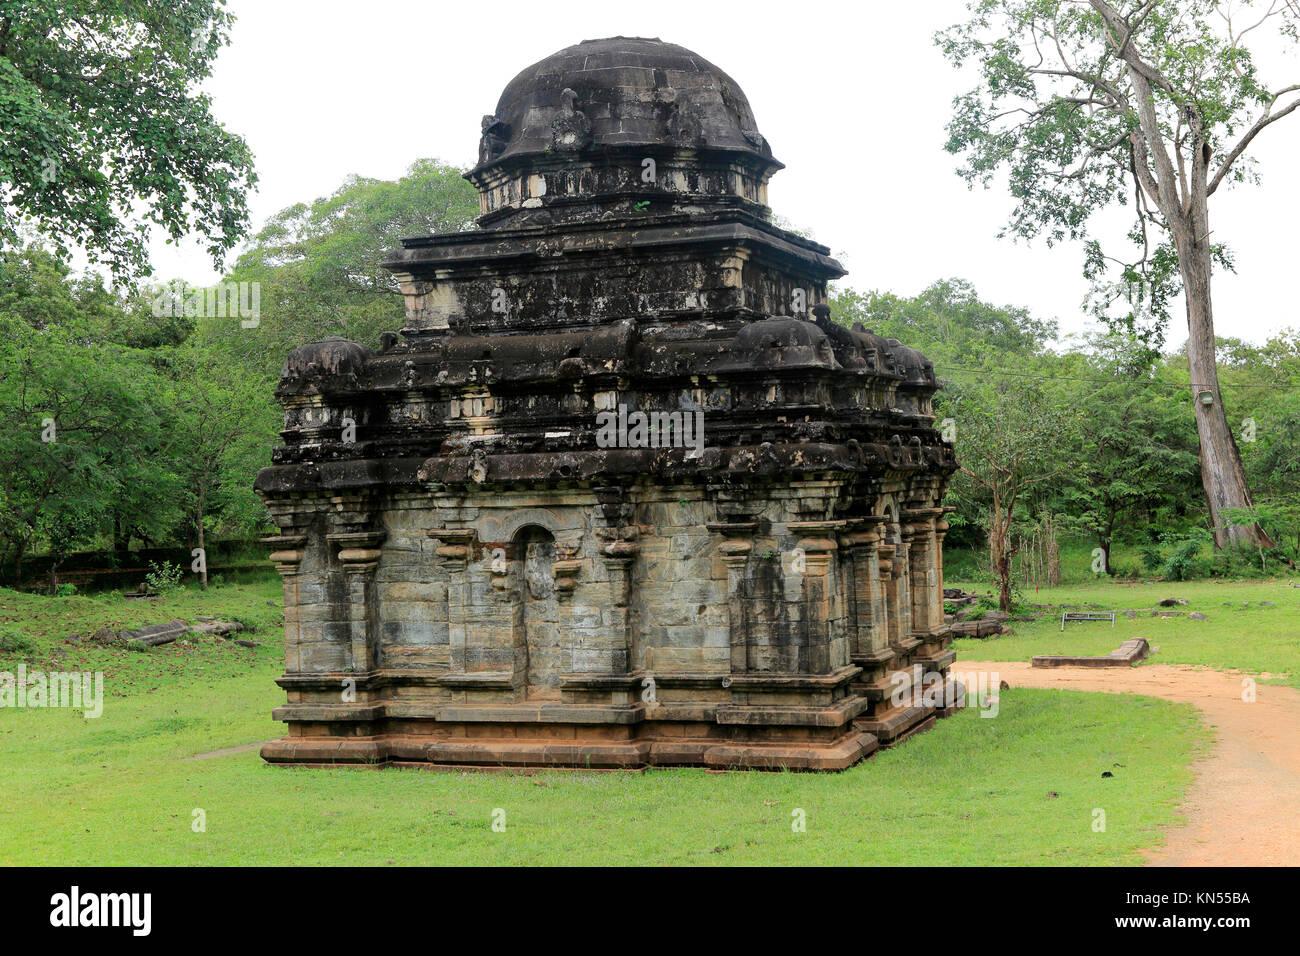 Shiva Devale number 2 temple, UNESCO World Heritage Site, the ancient city of Polonnaruwa, Sri Lanka, Asia - Stock Image